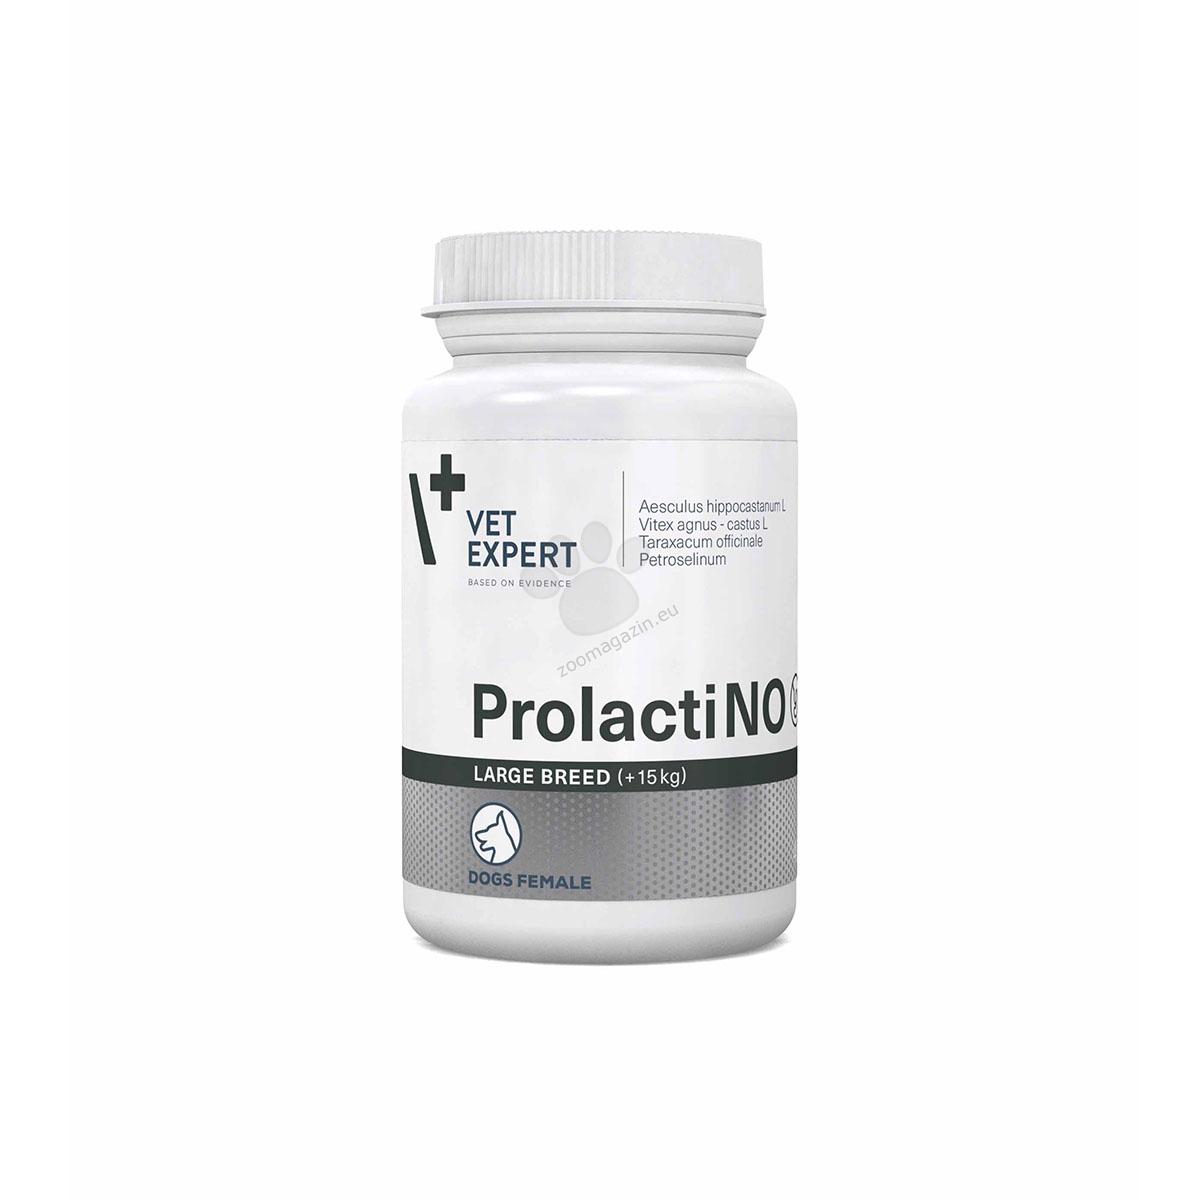 Vetexpert - ProlactiNO Large - естествен и ефикасен начин за контрол на лъжливата бременност, за големи породи 40 табл.